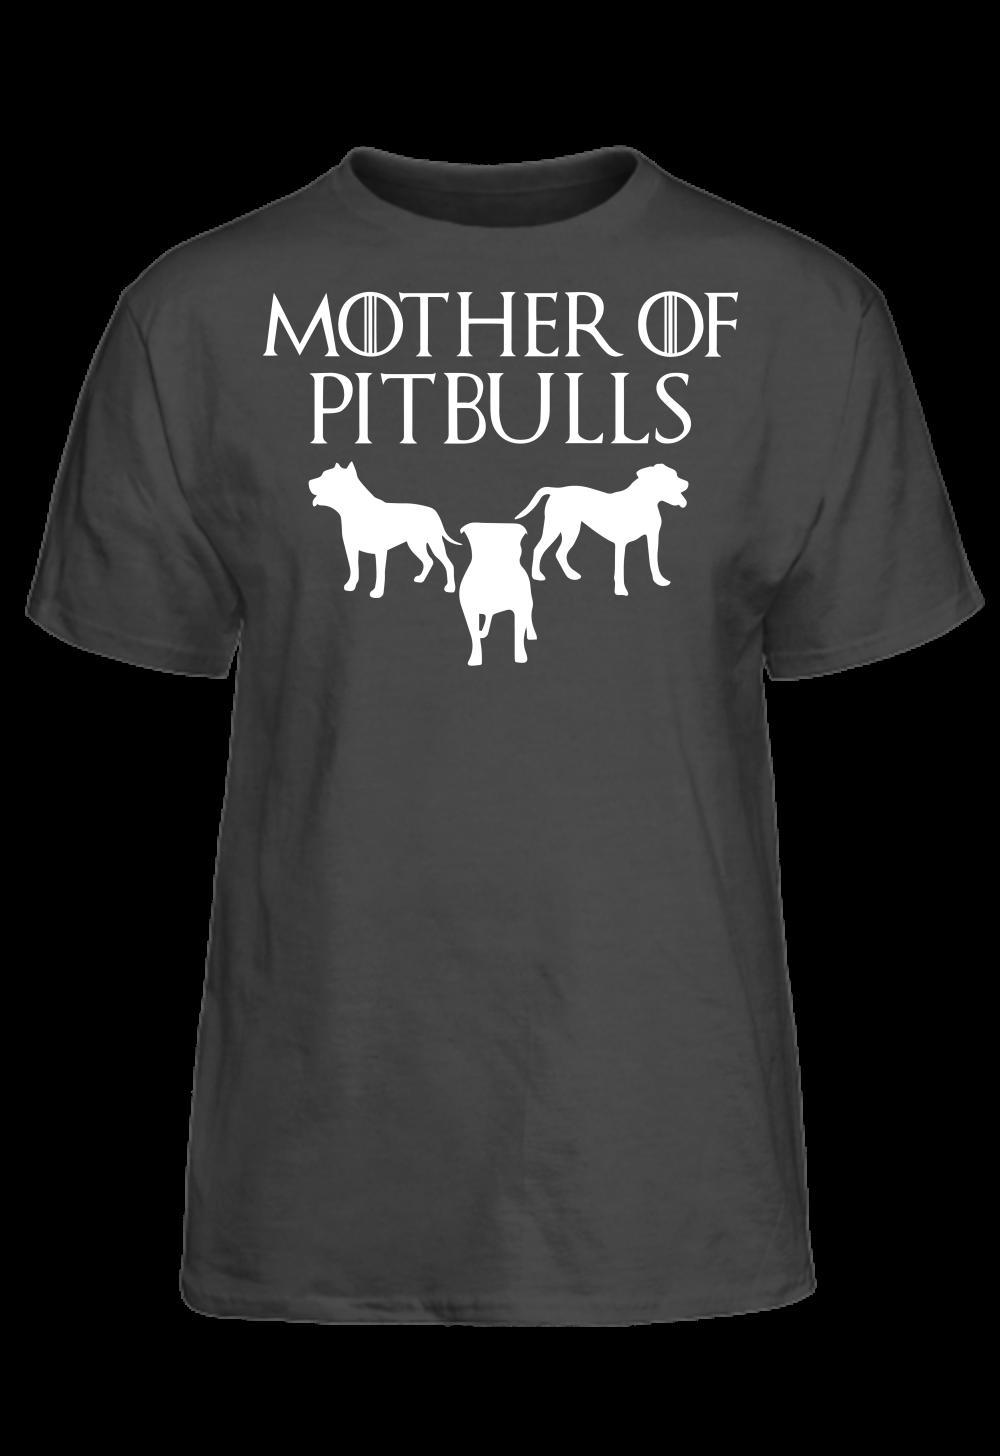 Mother of Pitbulls Basic Tee